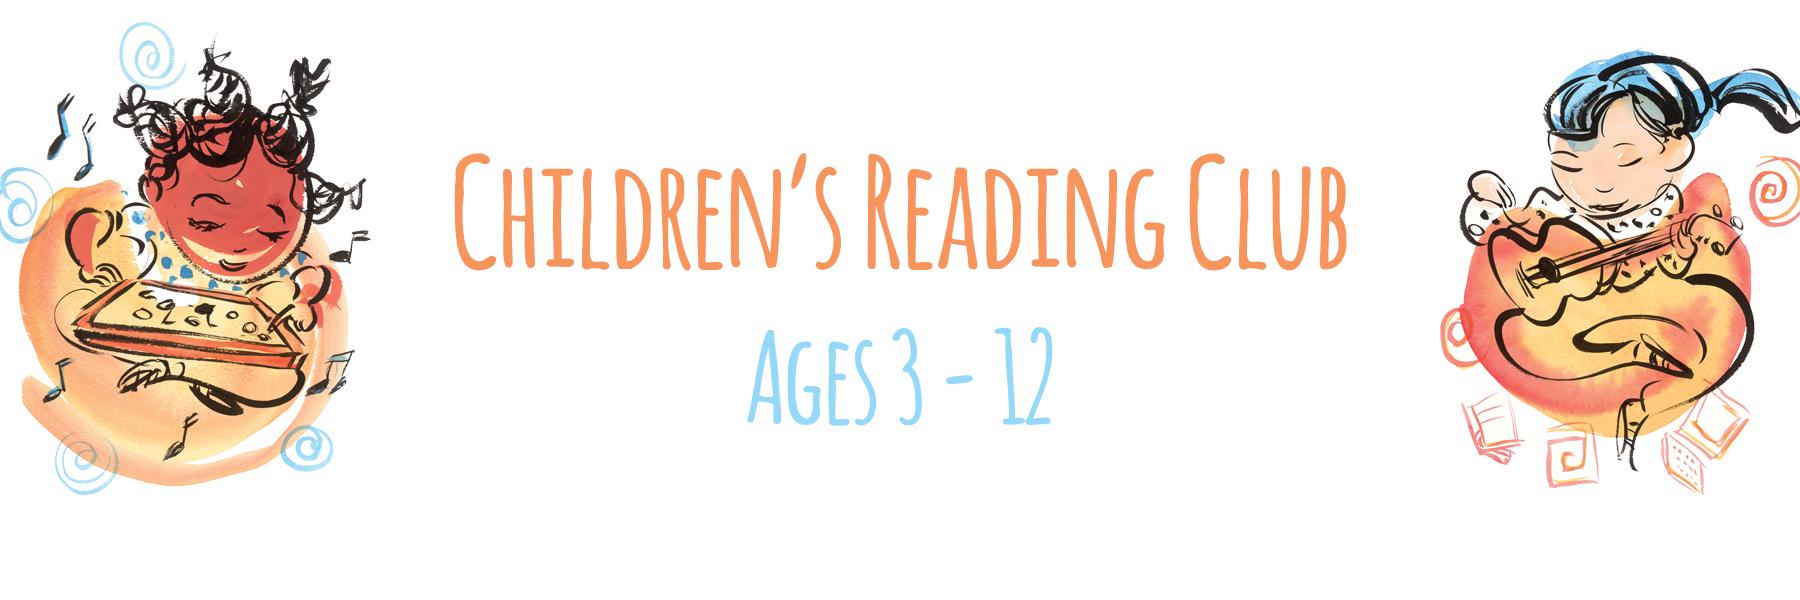 Children's Reading Club